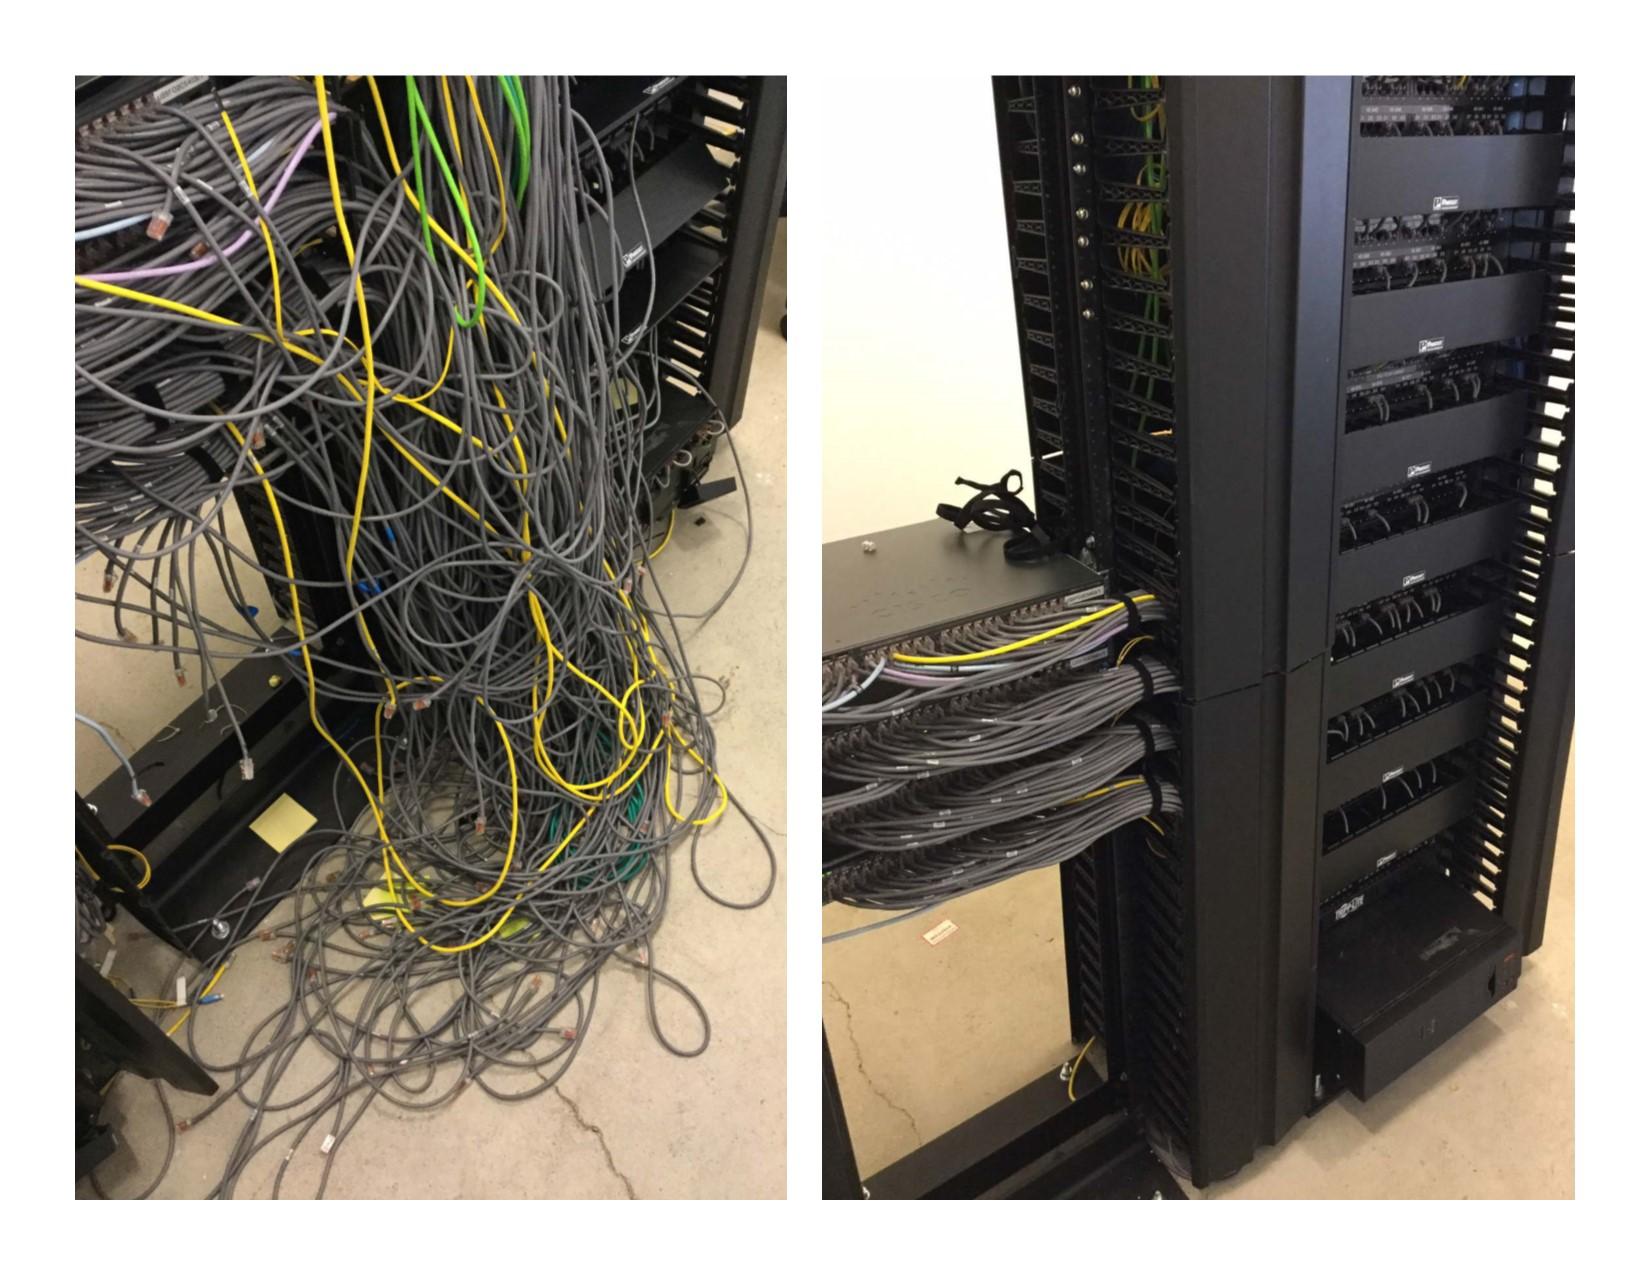 Telcom Entire Server Room Cleanup